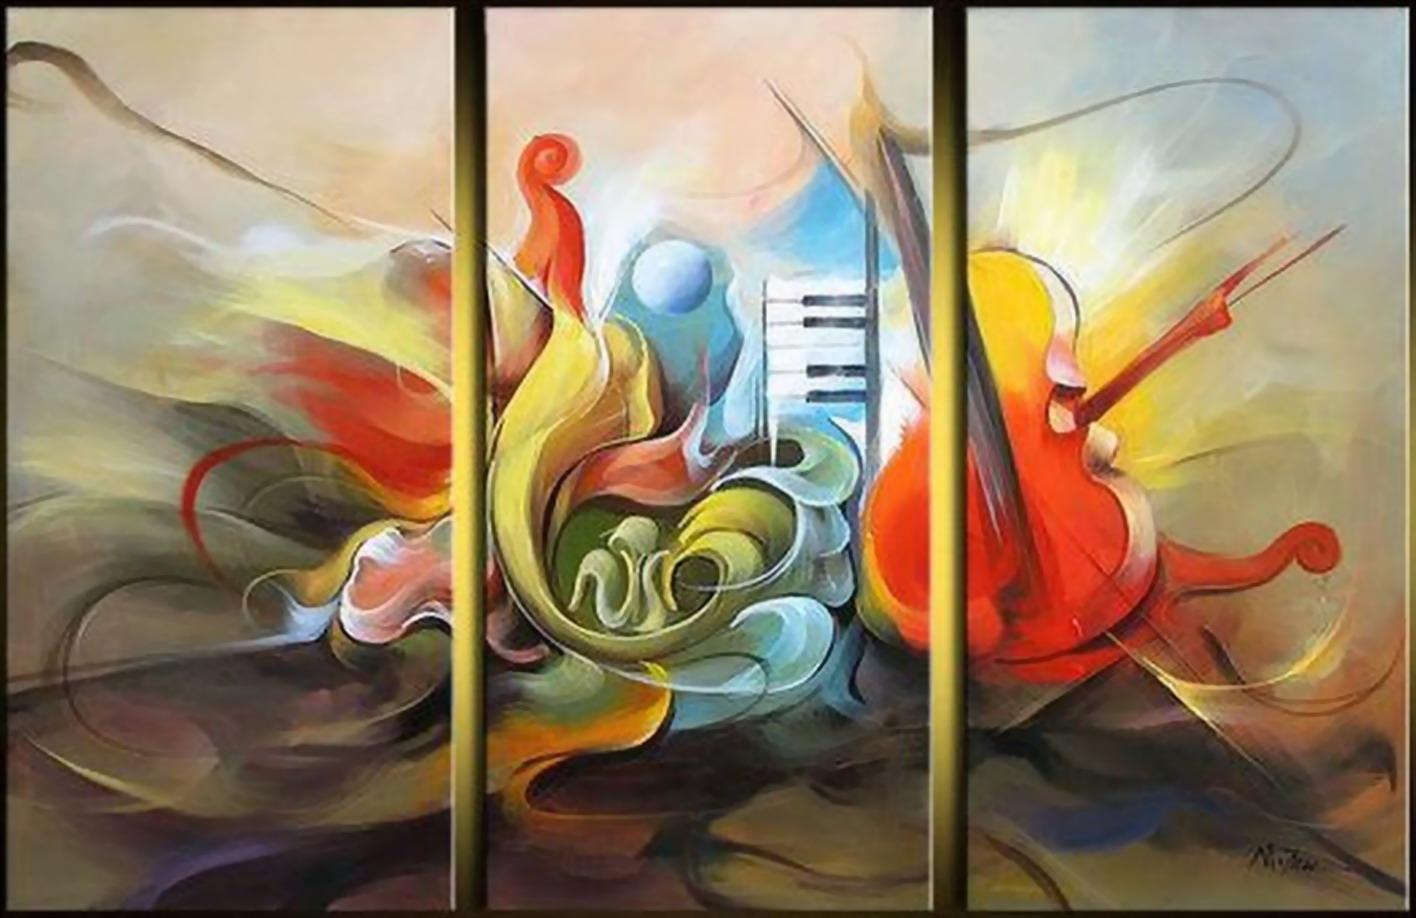 Cuadros modernos pinturas y dibujos 07 14 13 - Pinturas bodegones modernos ...